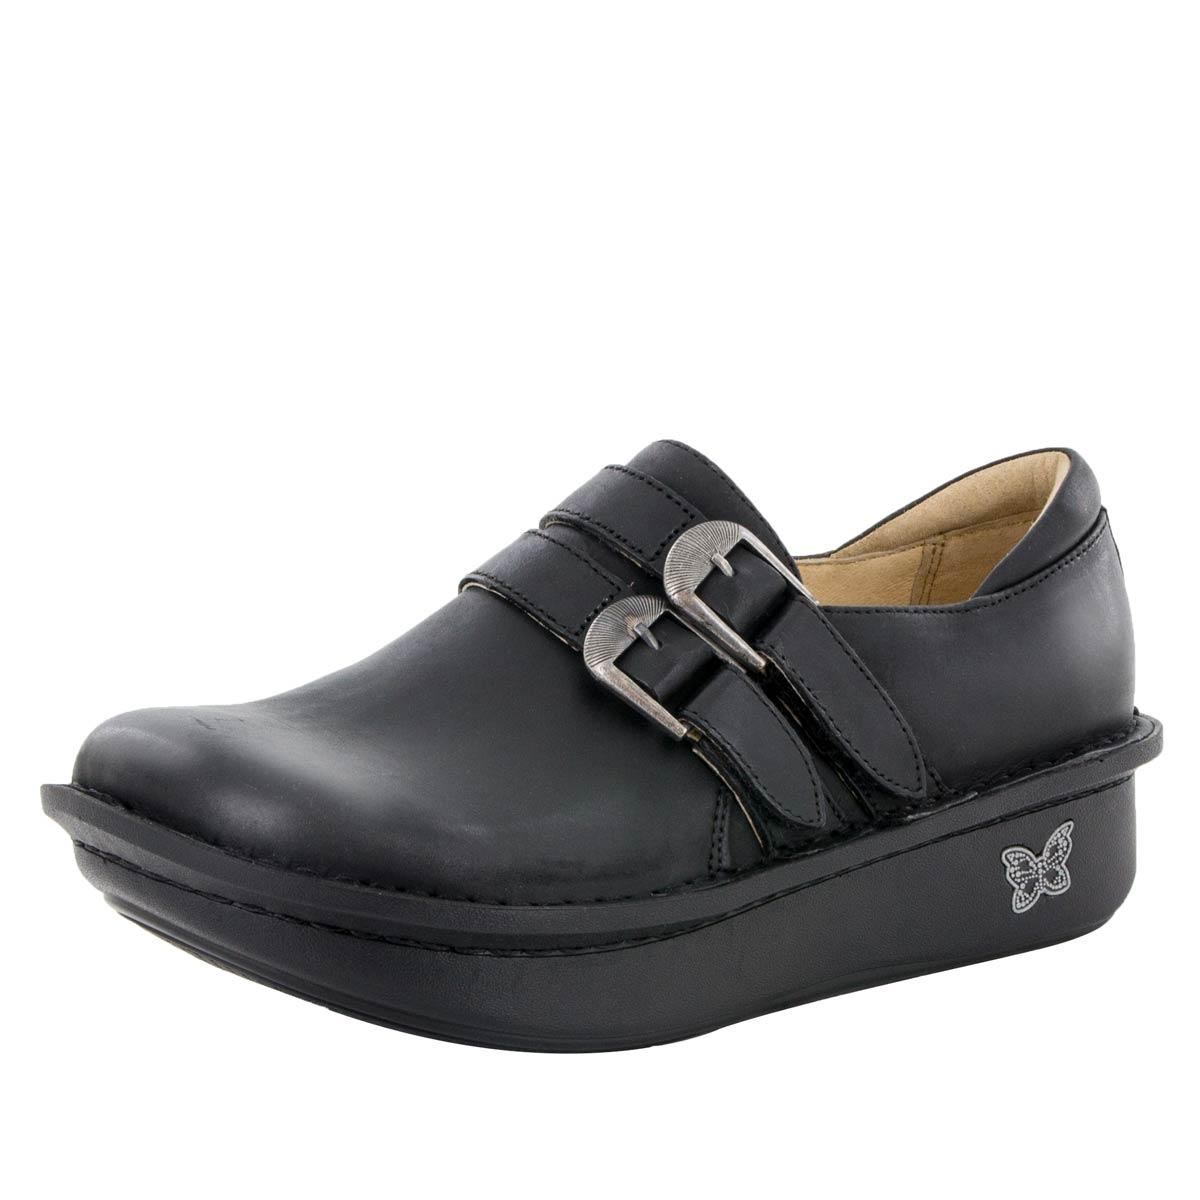 antimasyon comfortable toe mens men shoes oxford s grip genuine steel slip resistant comforter